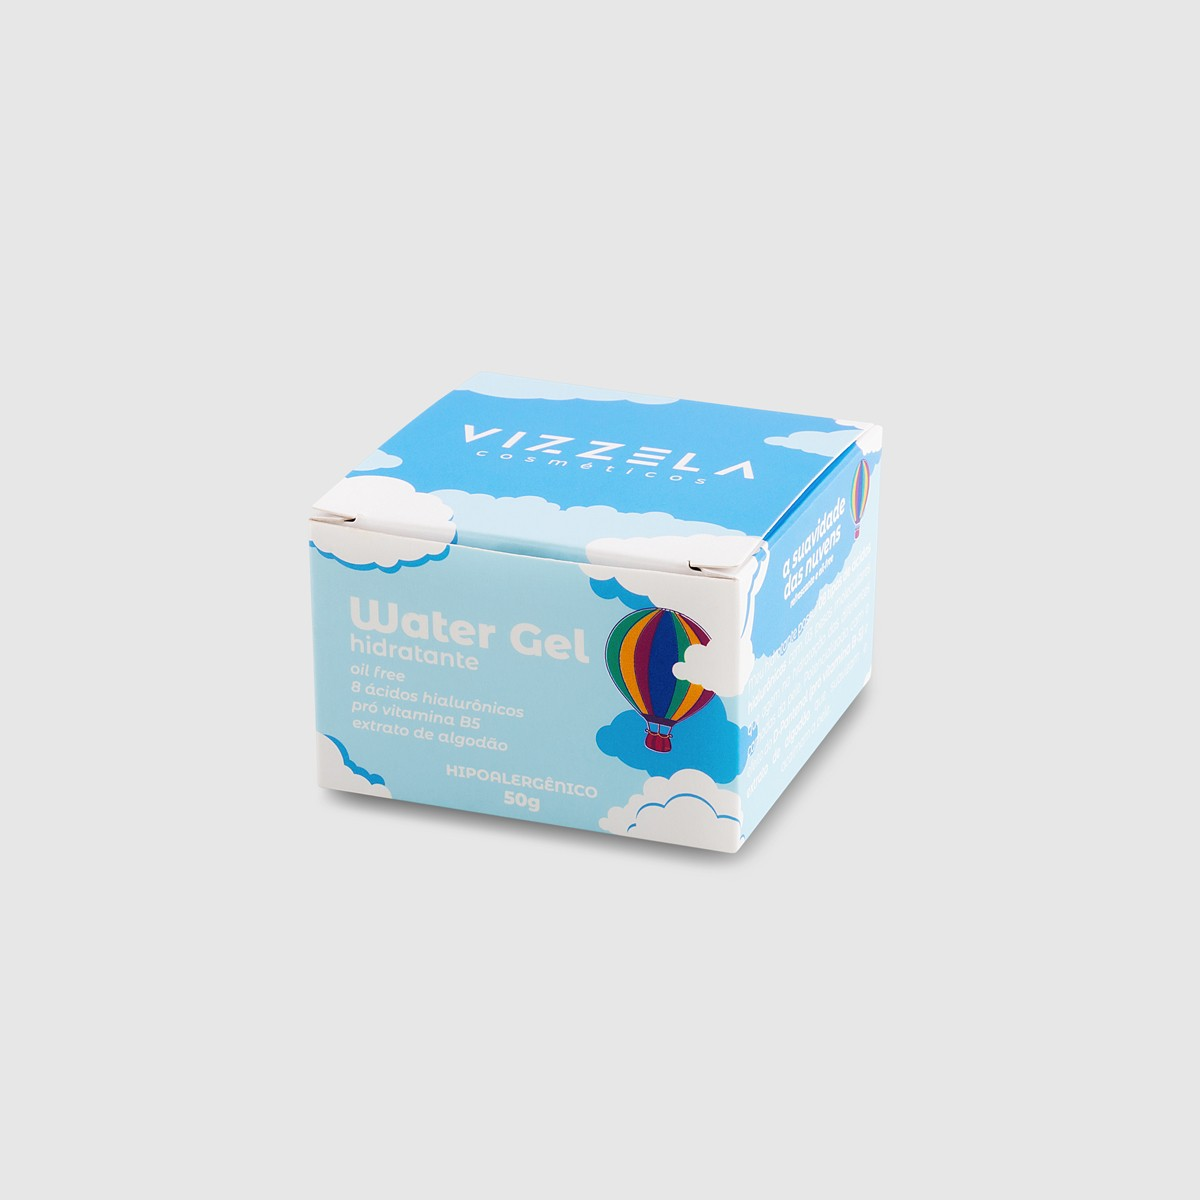 Water Gel Hidratante - Vizzela 50g